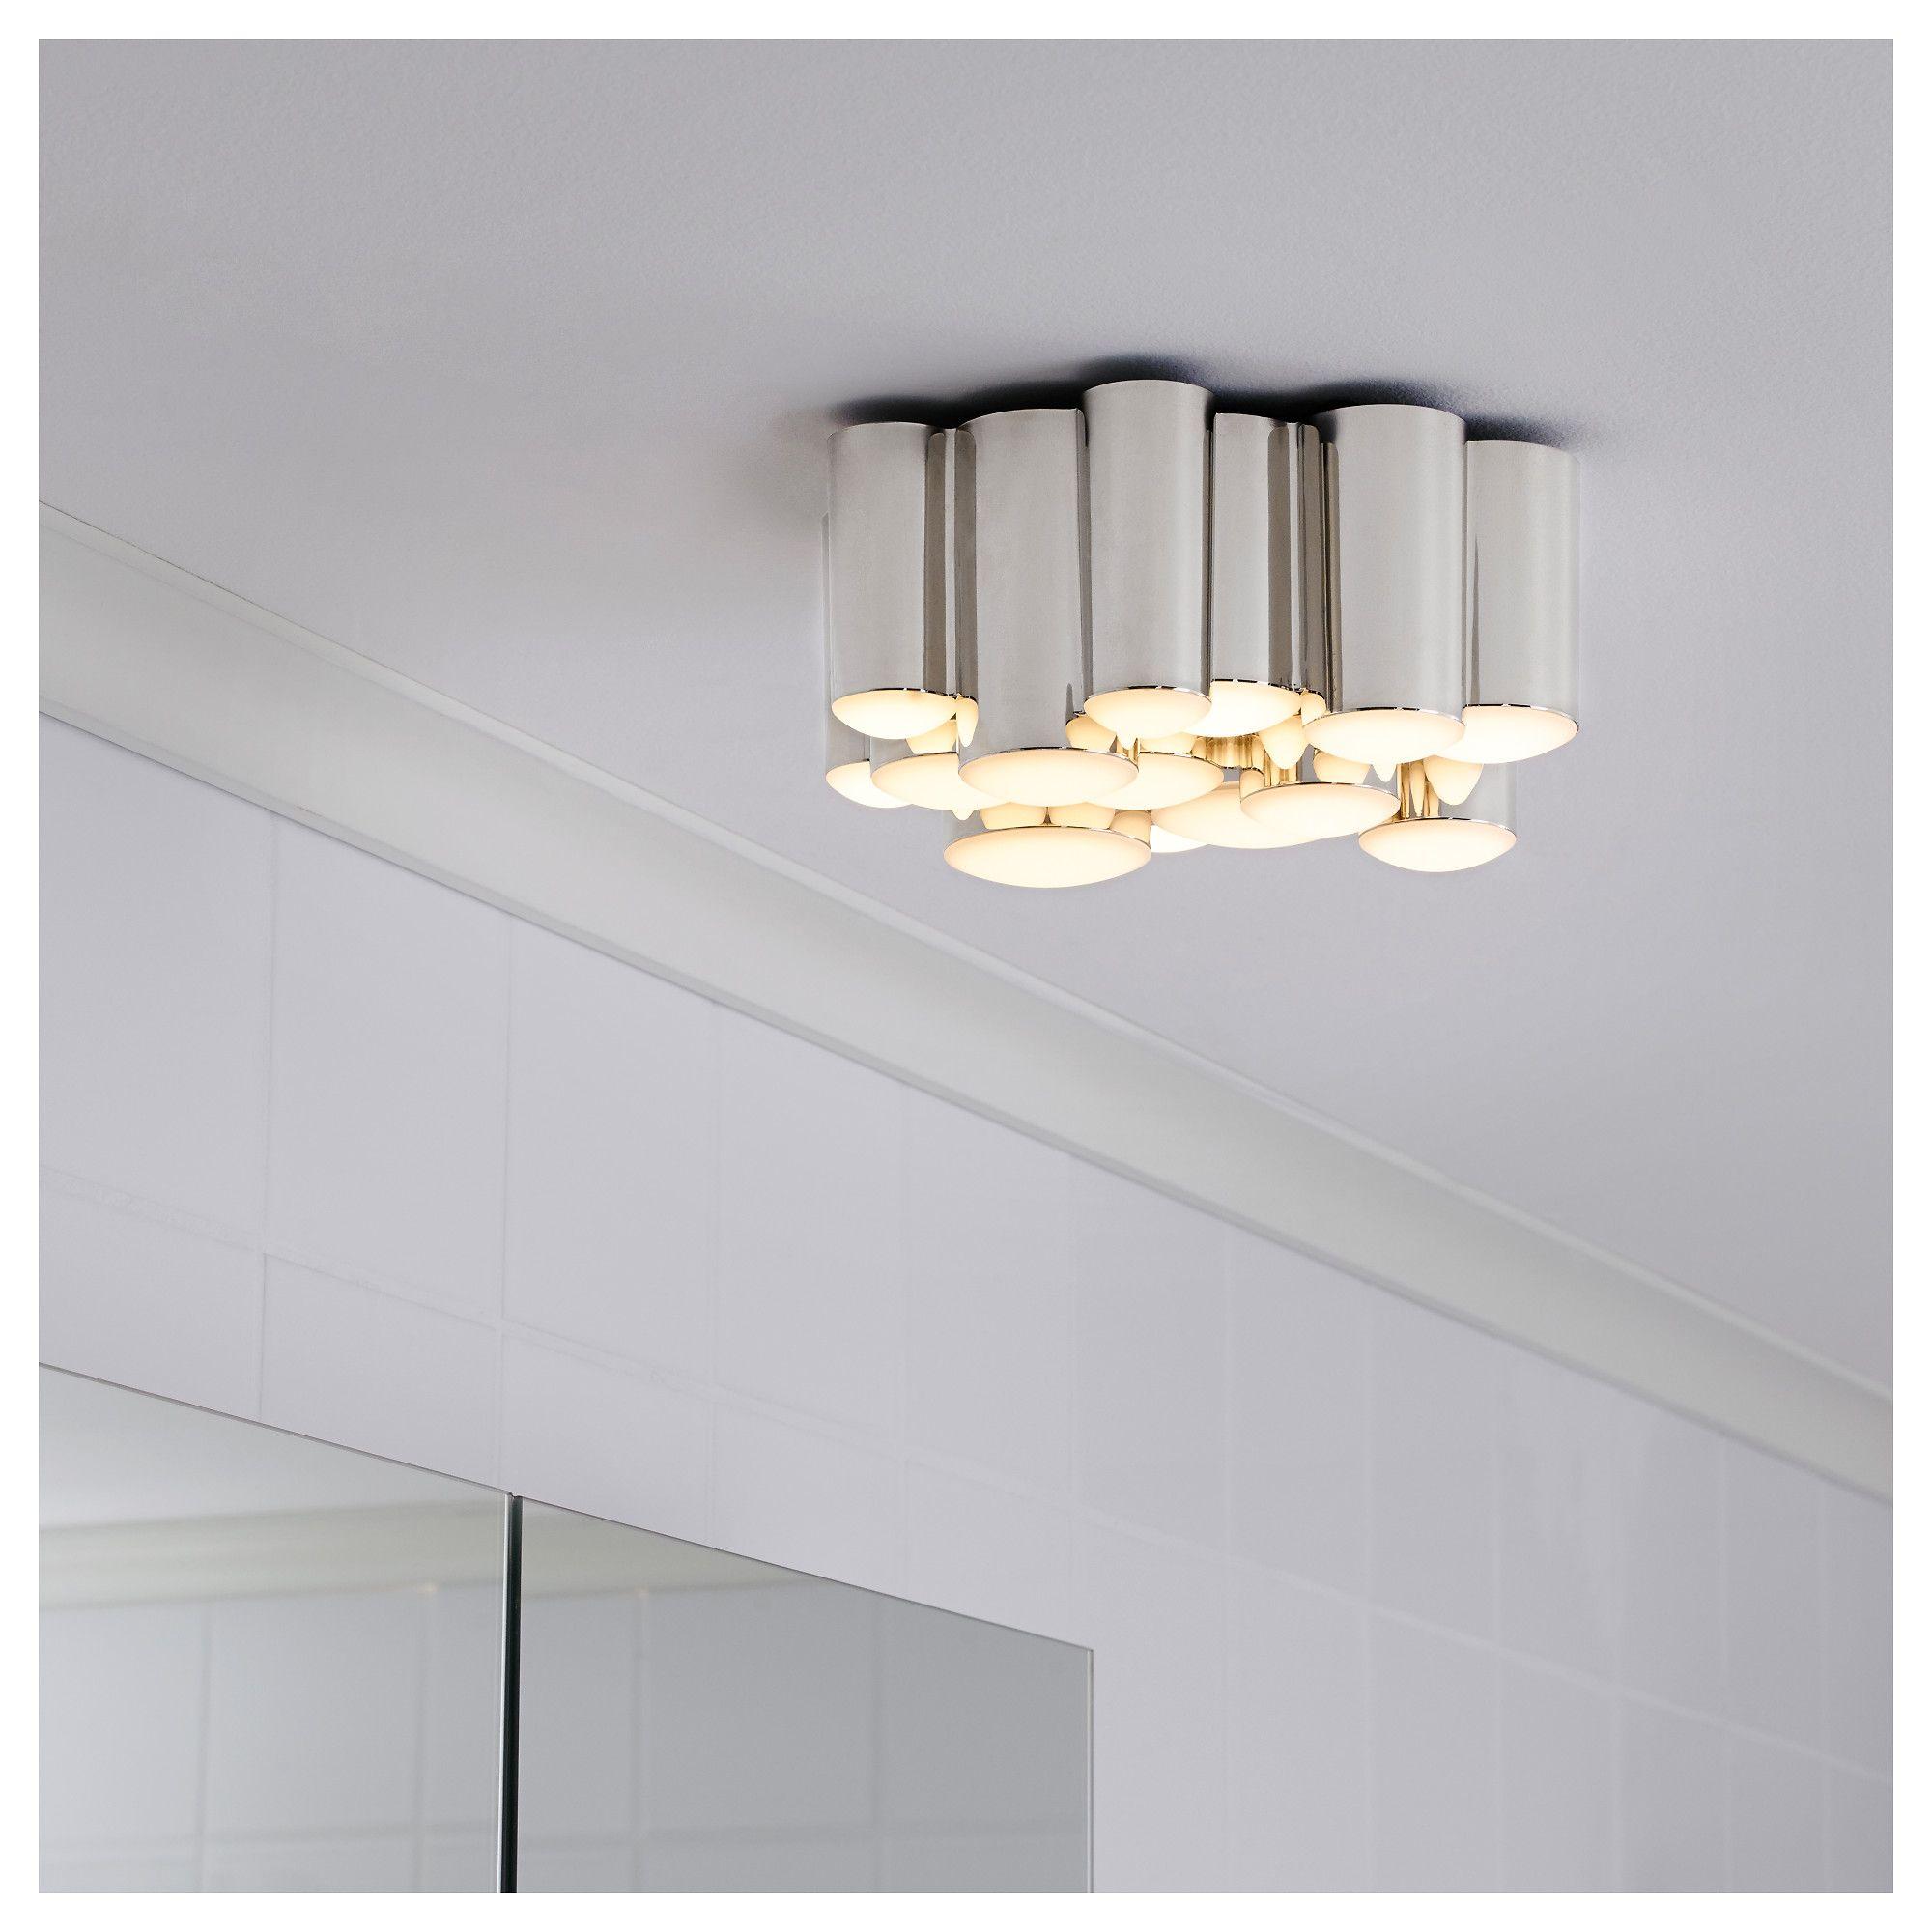 SODERSVIK   LED лампа за таван   IKEA   Bathroom light ...